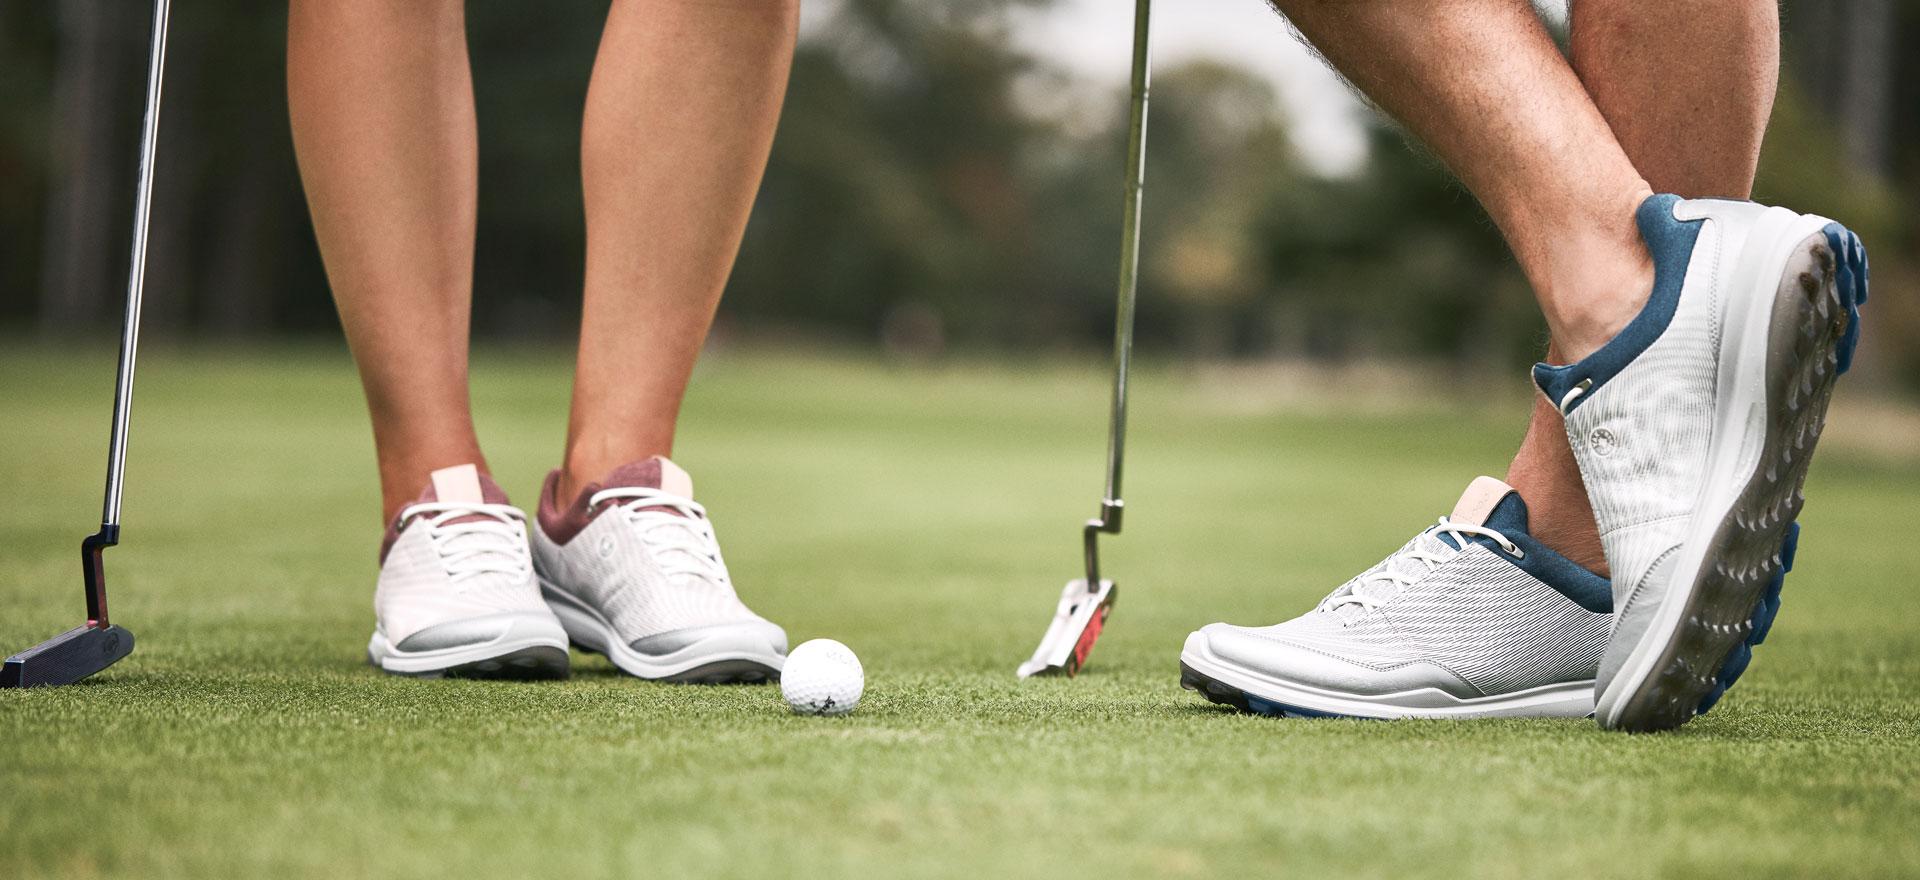 golf-highlight-aw19.jpg